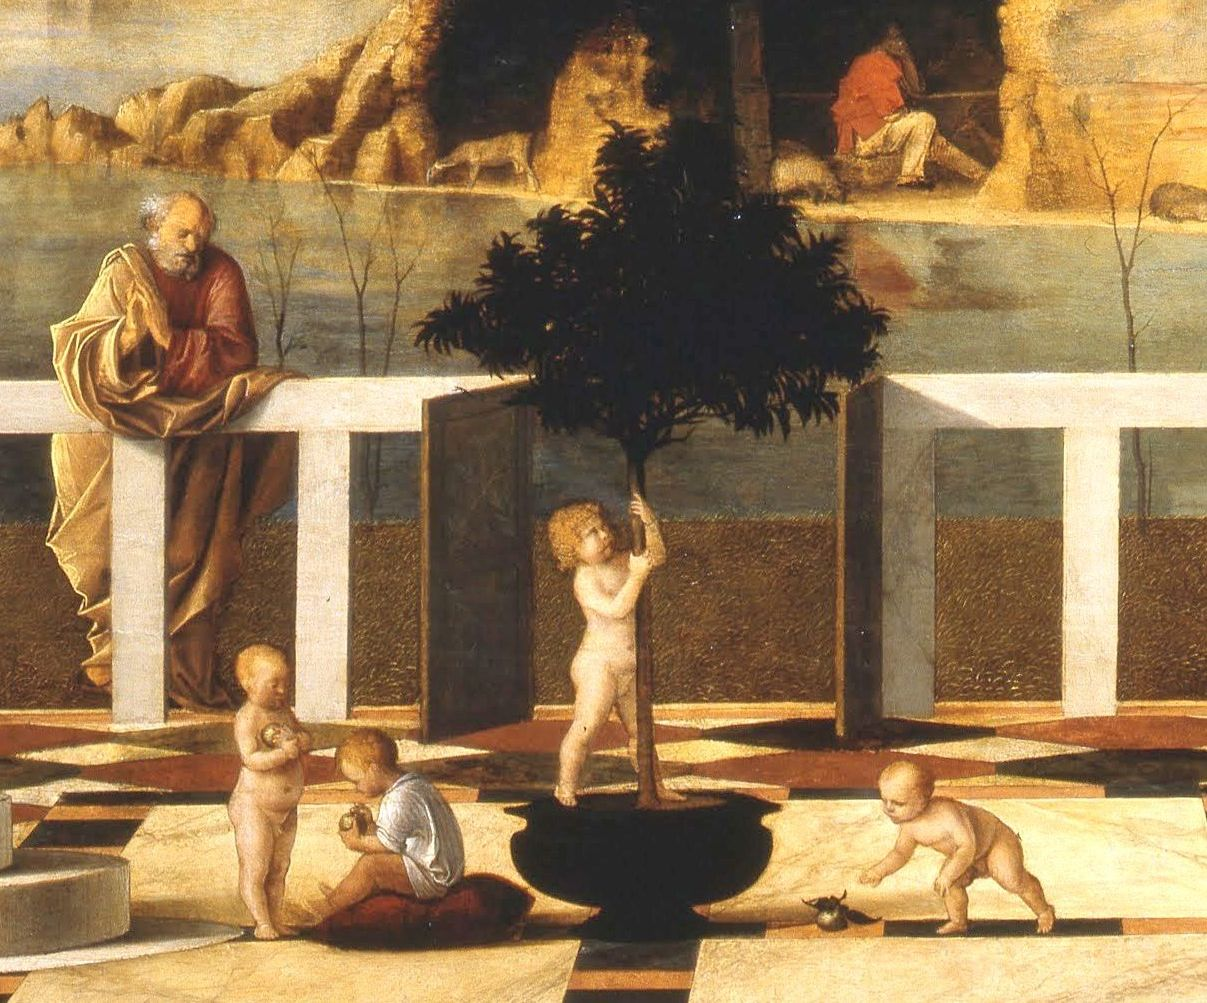 giovanni_bellini-allegoria_sacra-detail3.jpg